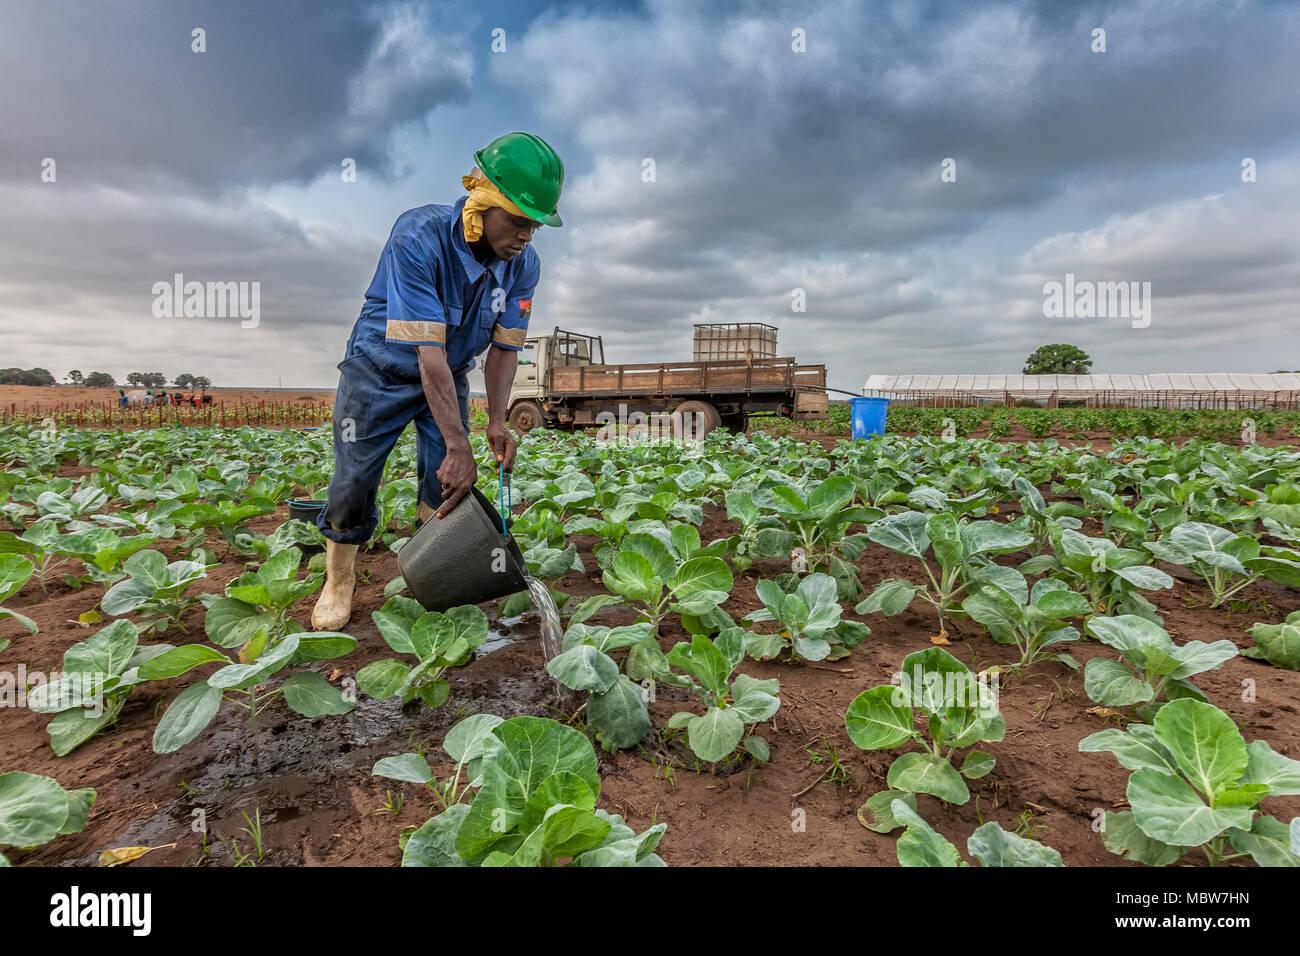 CABINDA/ANGOLA - 09 JUN 2010 - African farmer watering cabbage planting, Cabinda. Angola. - Stock Image